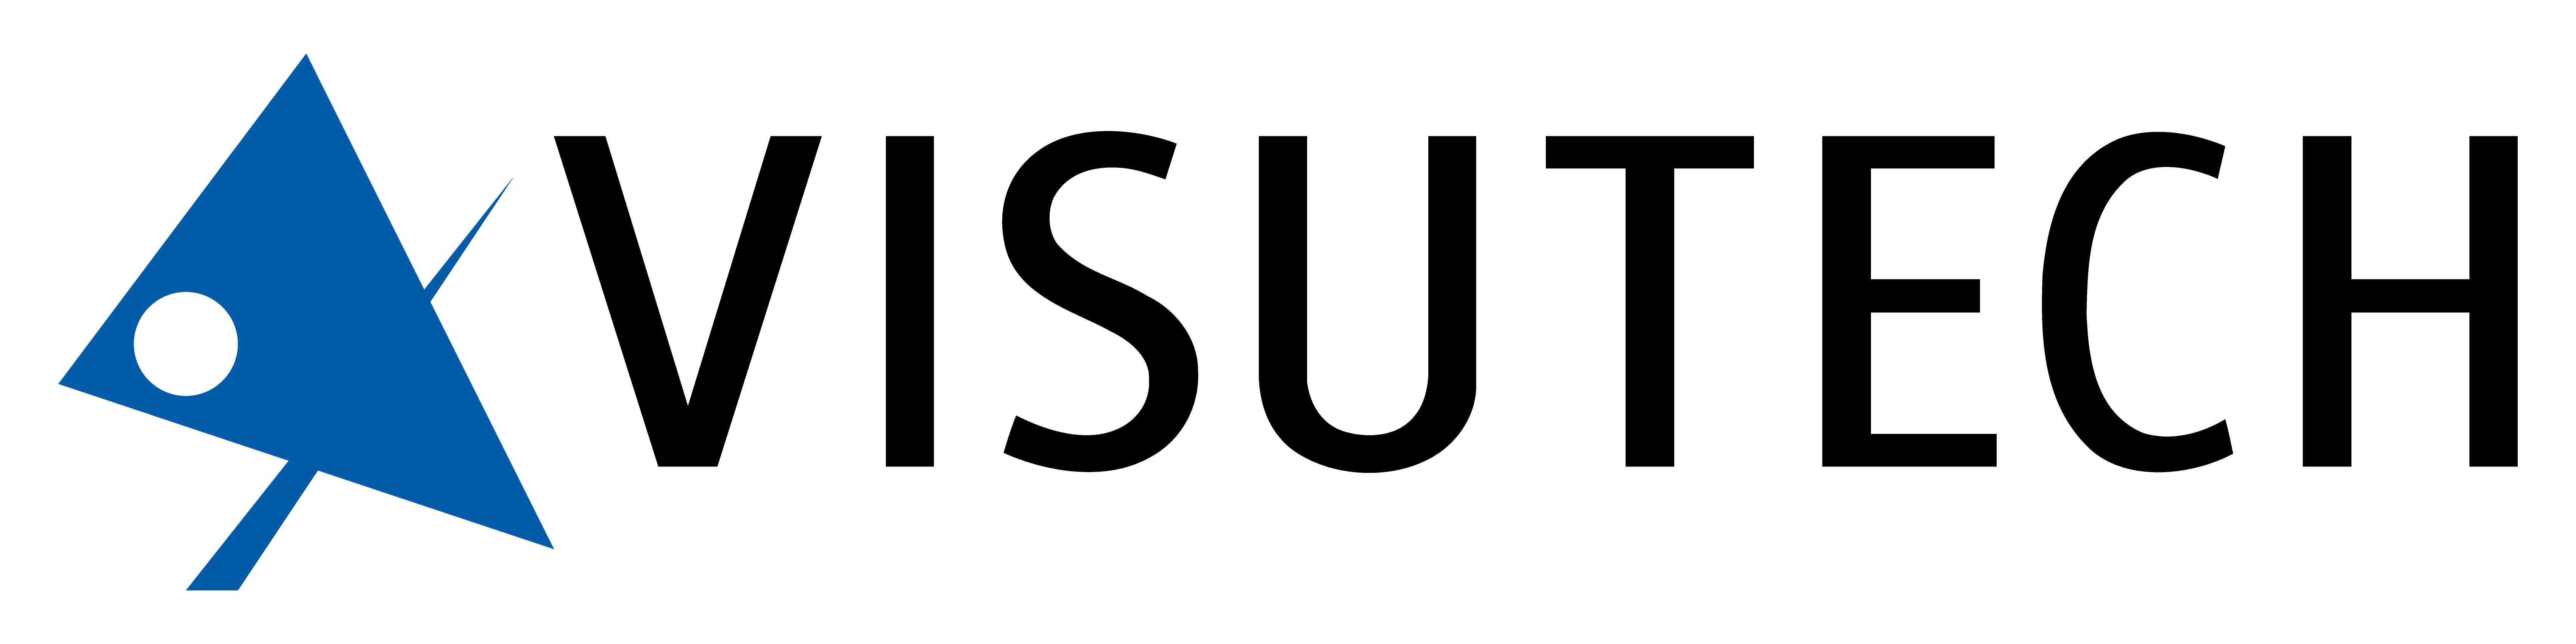 1_logo_4cblk